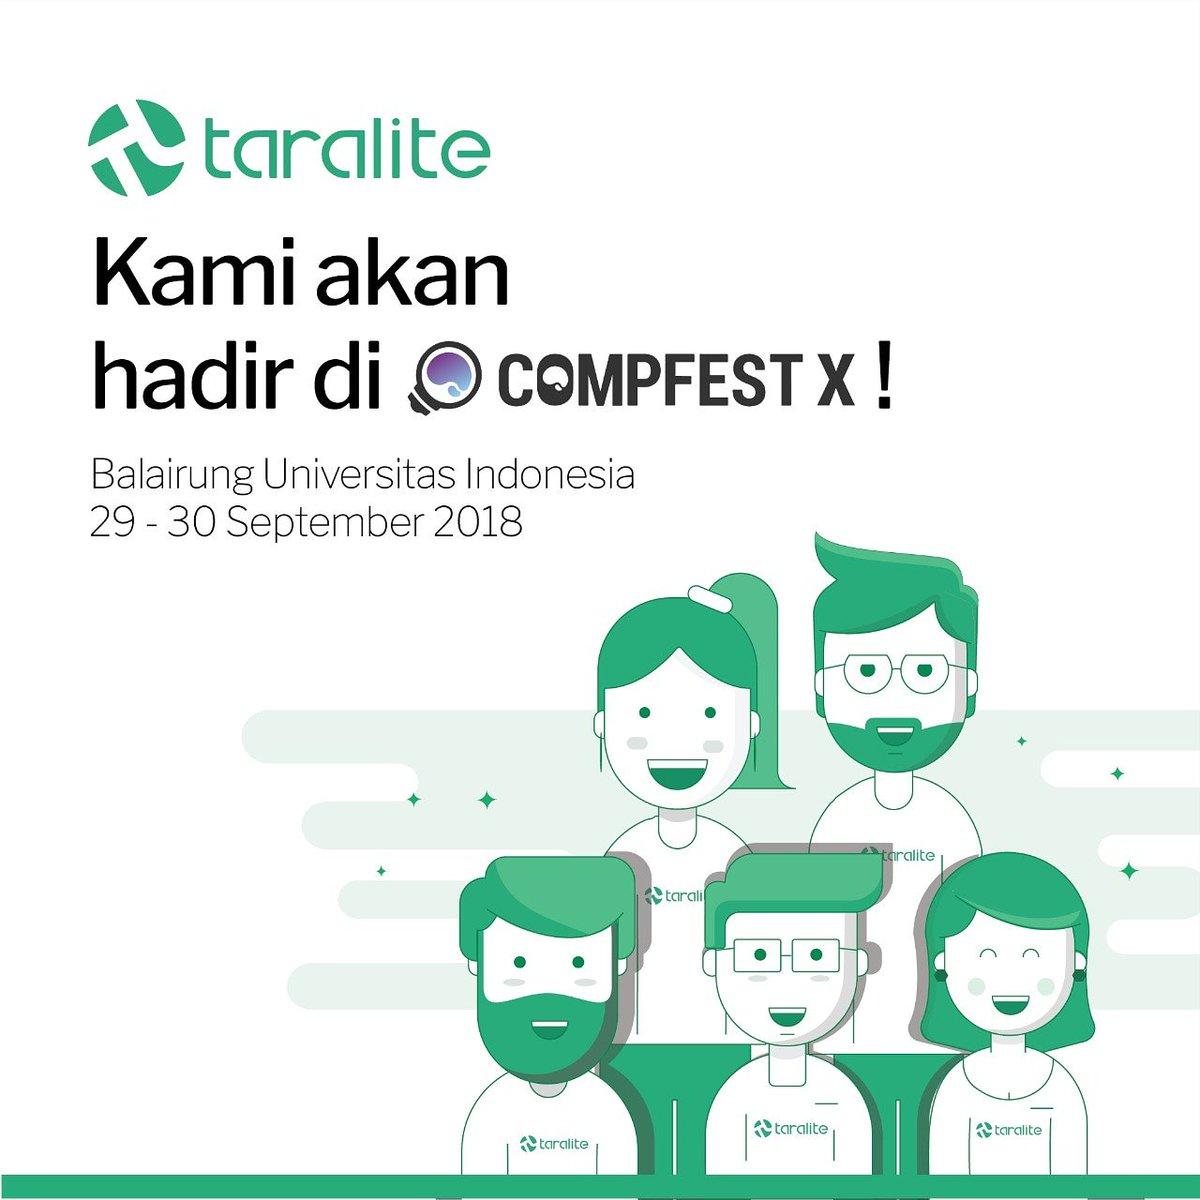 Taralite (@Taralite_id) | Twitter